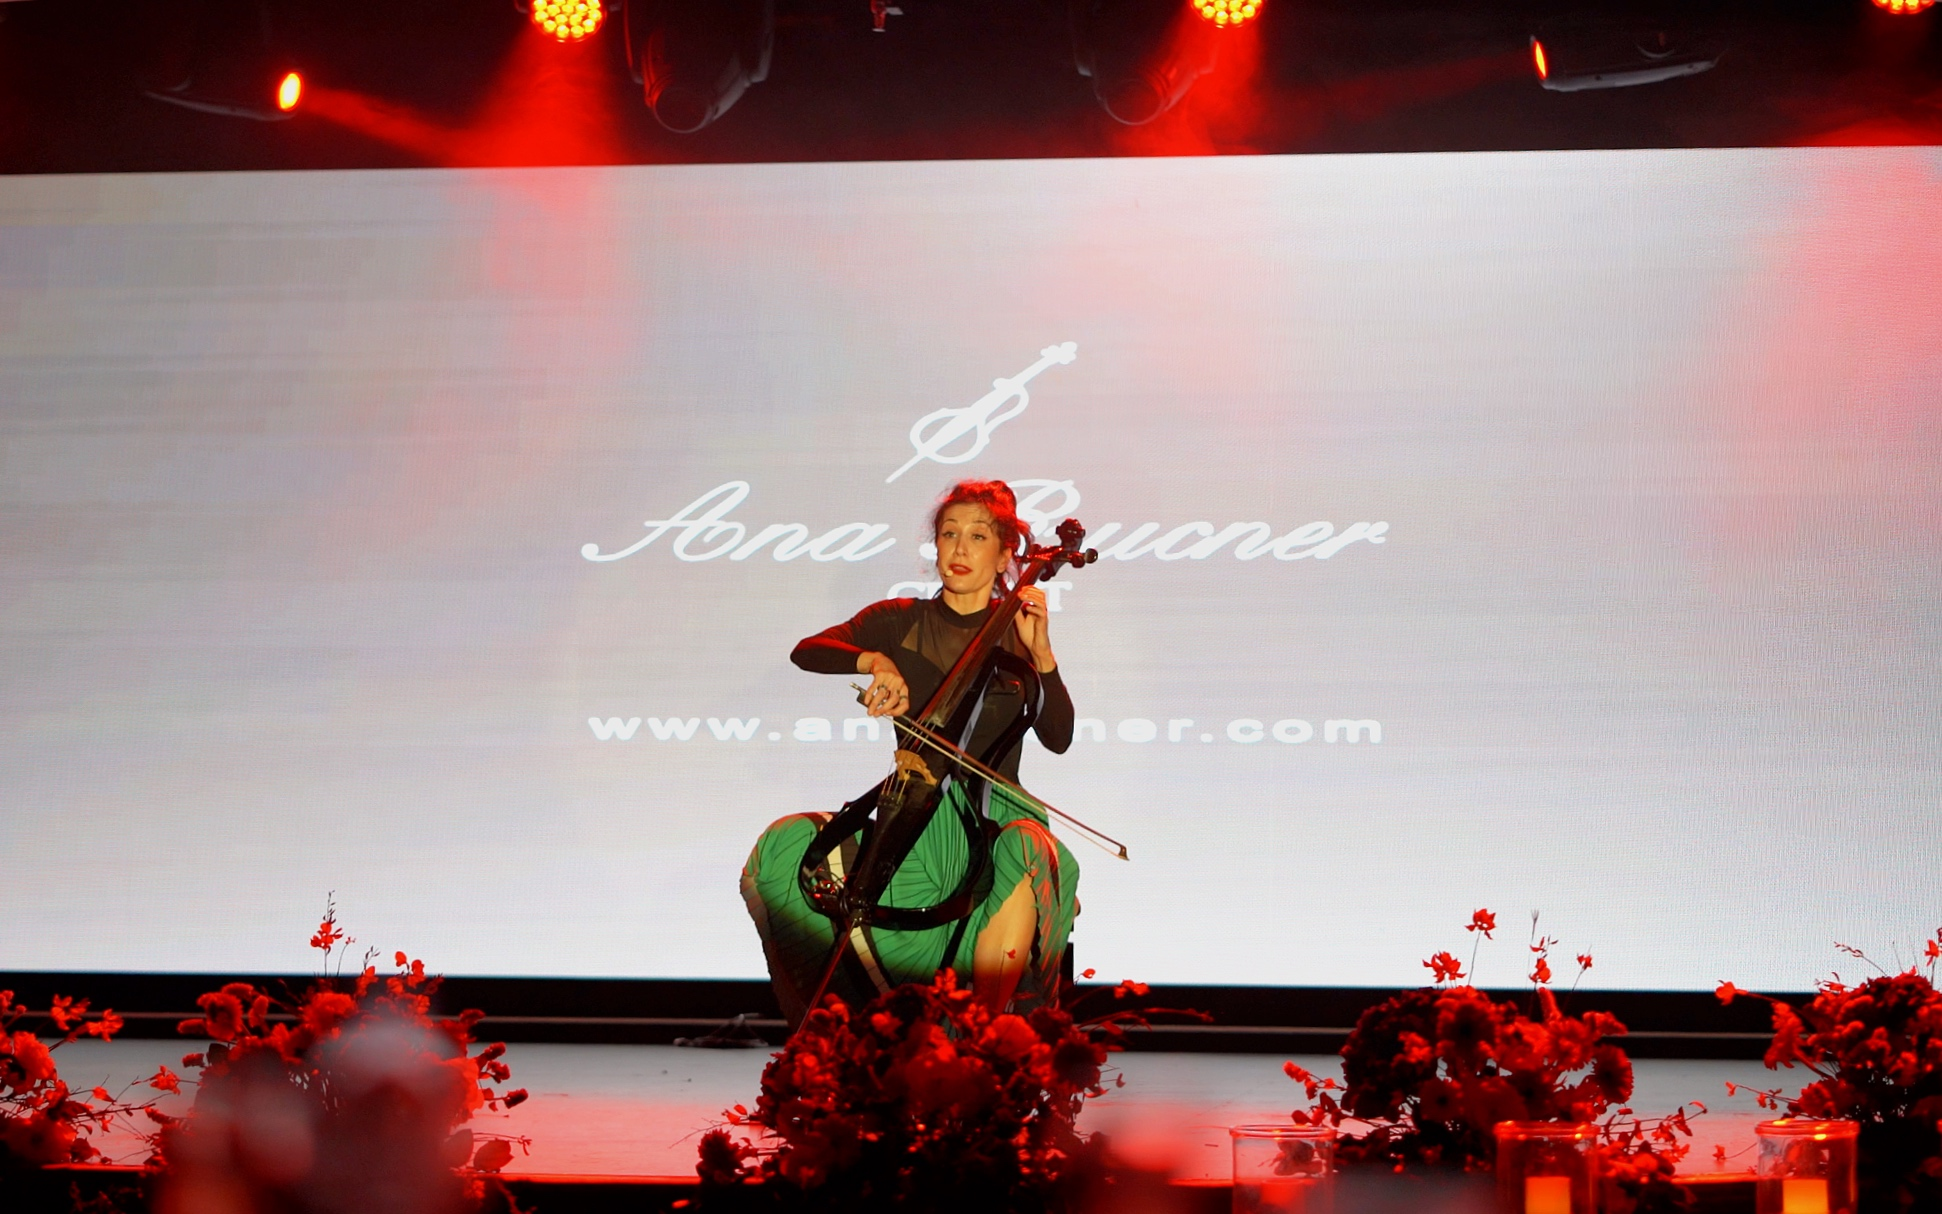 The Azamazing evening entertainer, Ana Rucner.